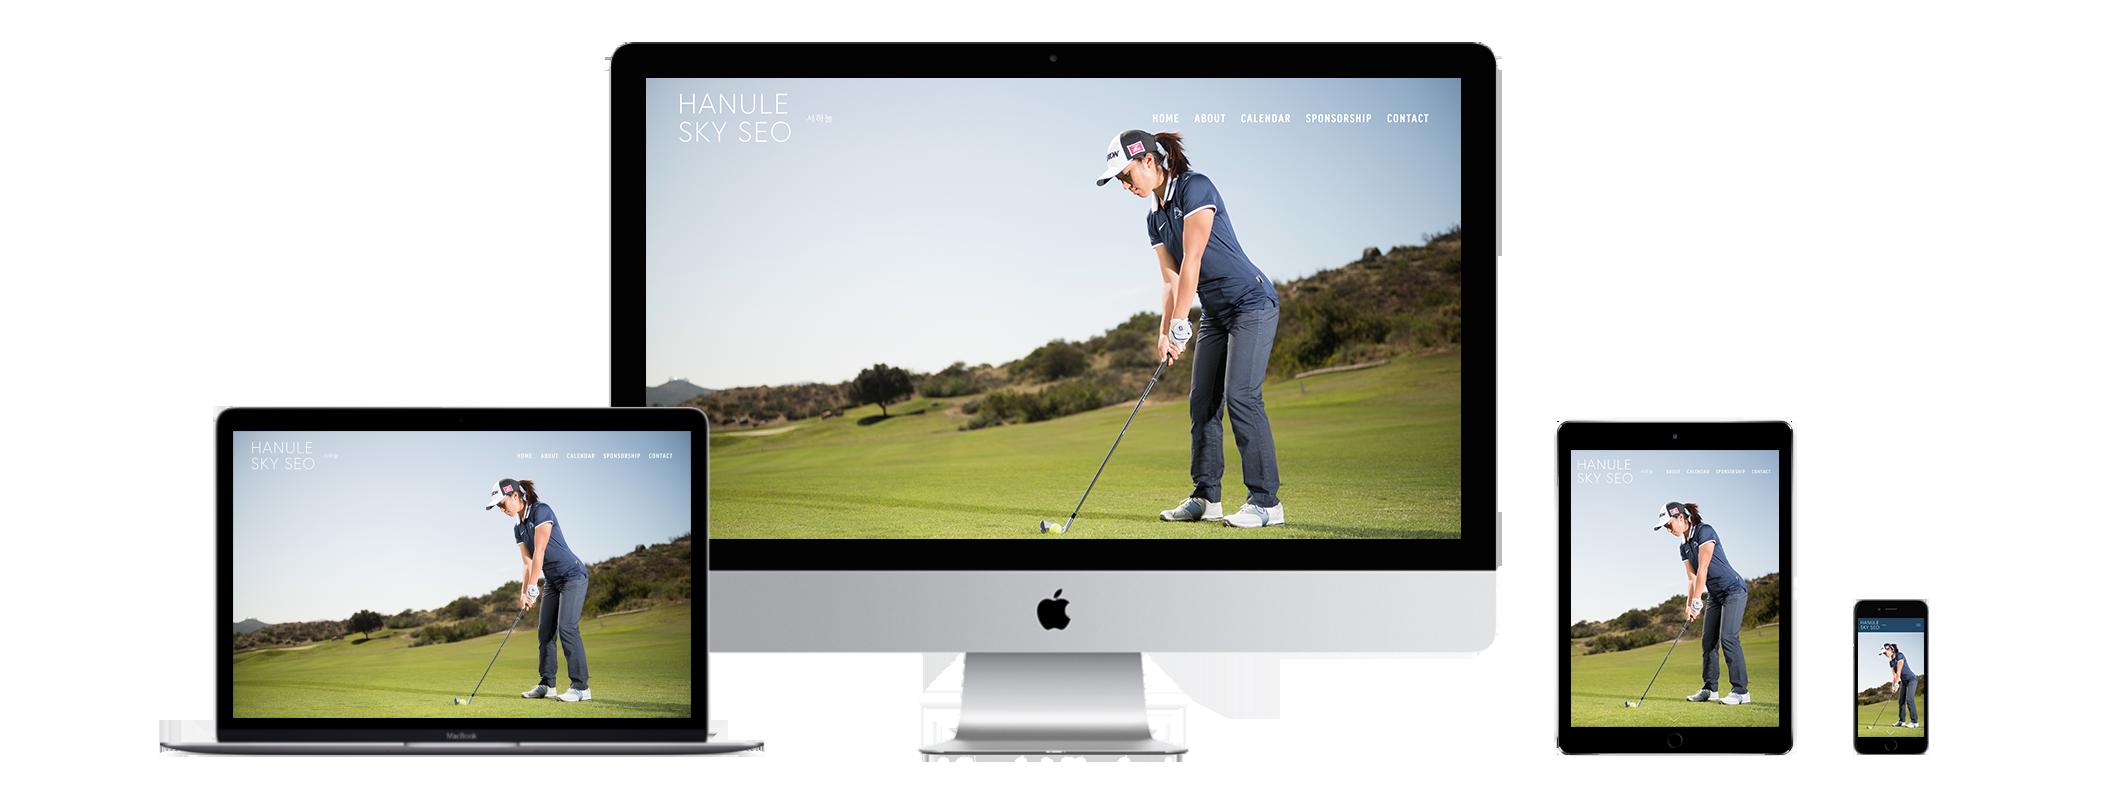 XYZ Design | Hanule Sky Seo Website Device Displays